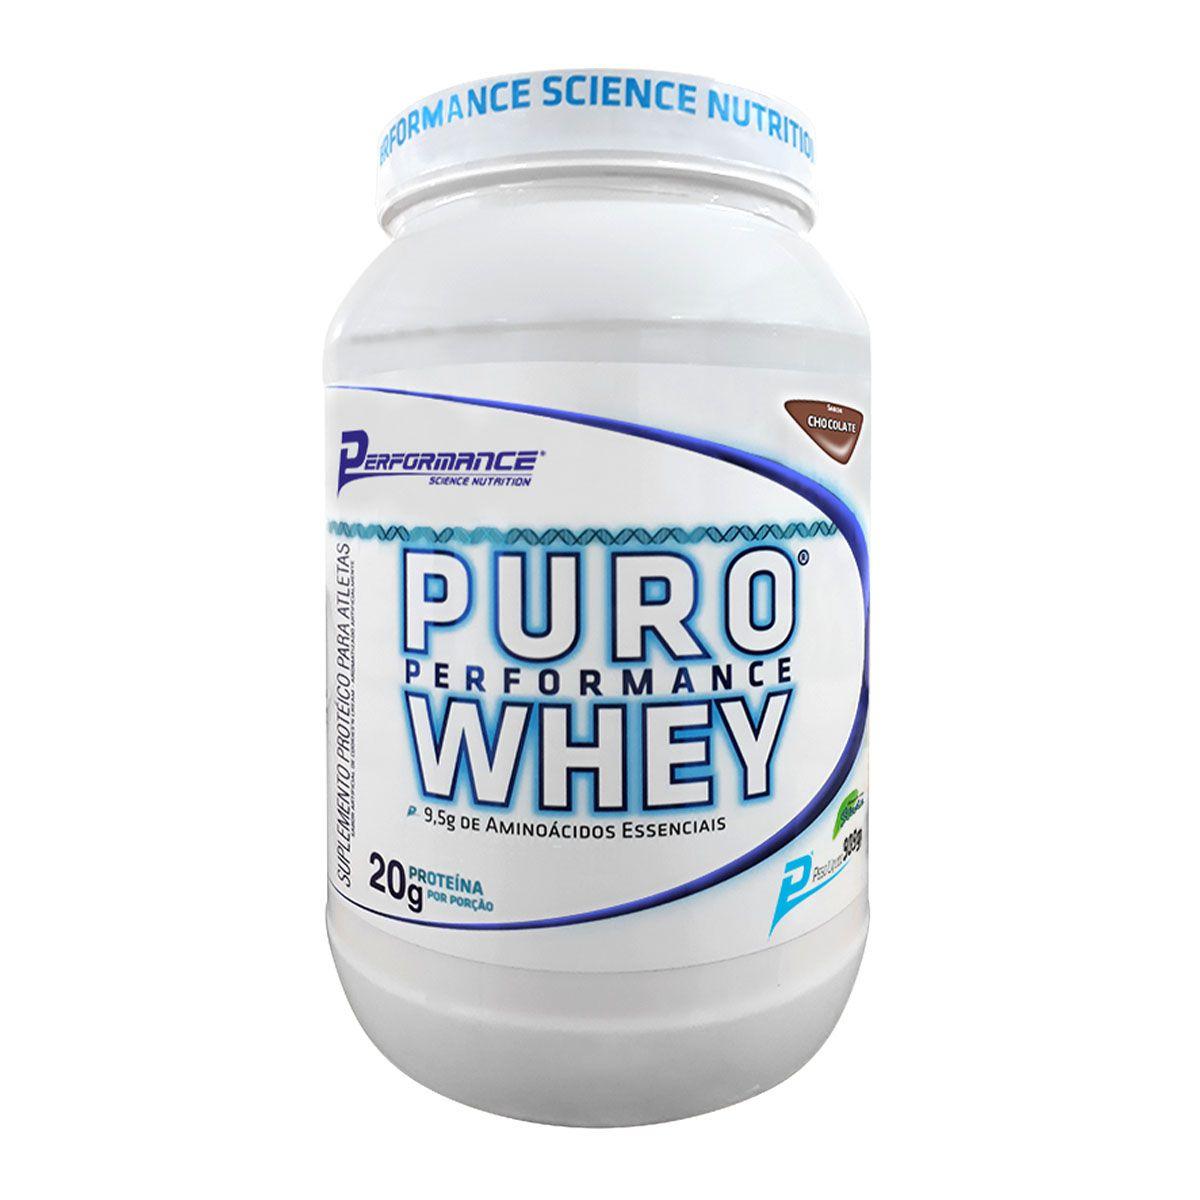 Puro Whey 909g - Performance Nutrition